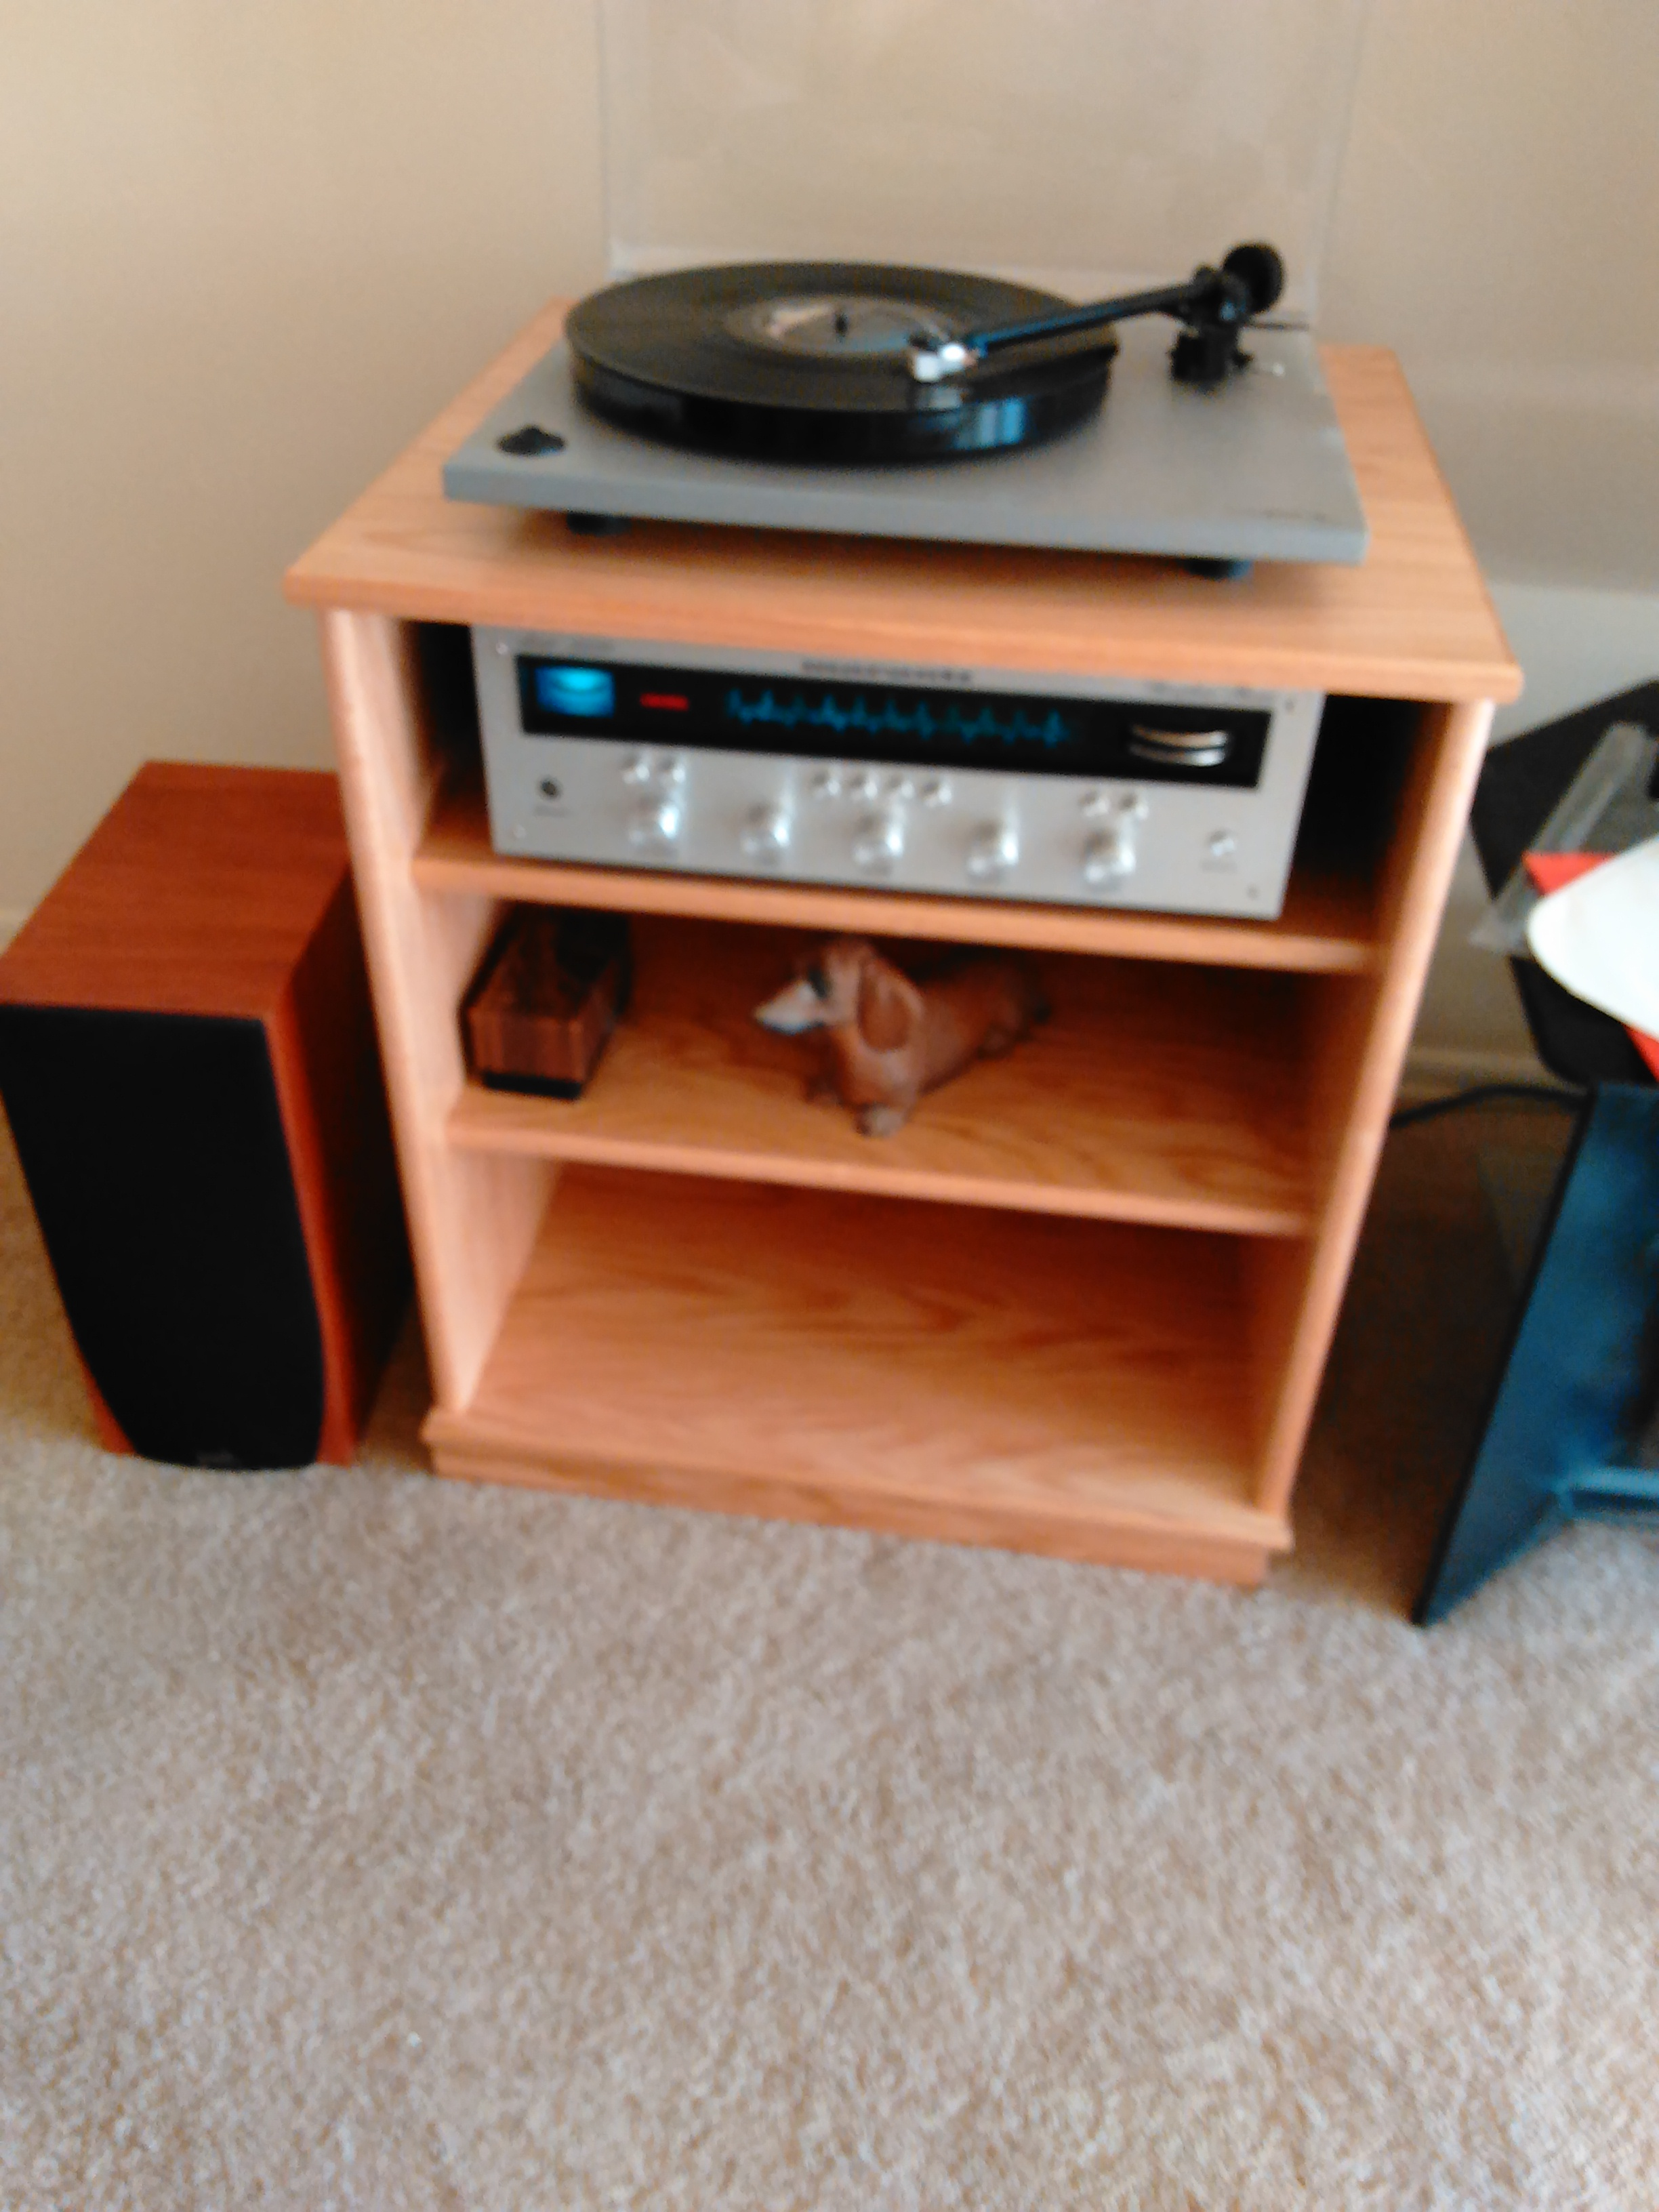 img-20170125-122201.jpg custom maple stereo cabinet by decibeldesigns.com